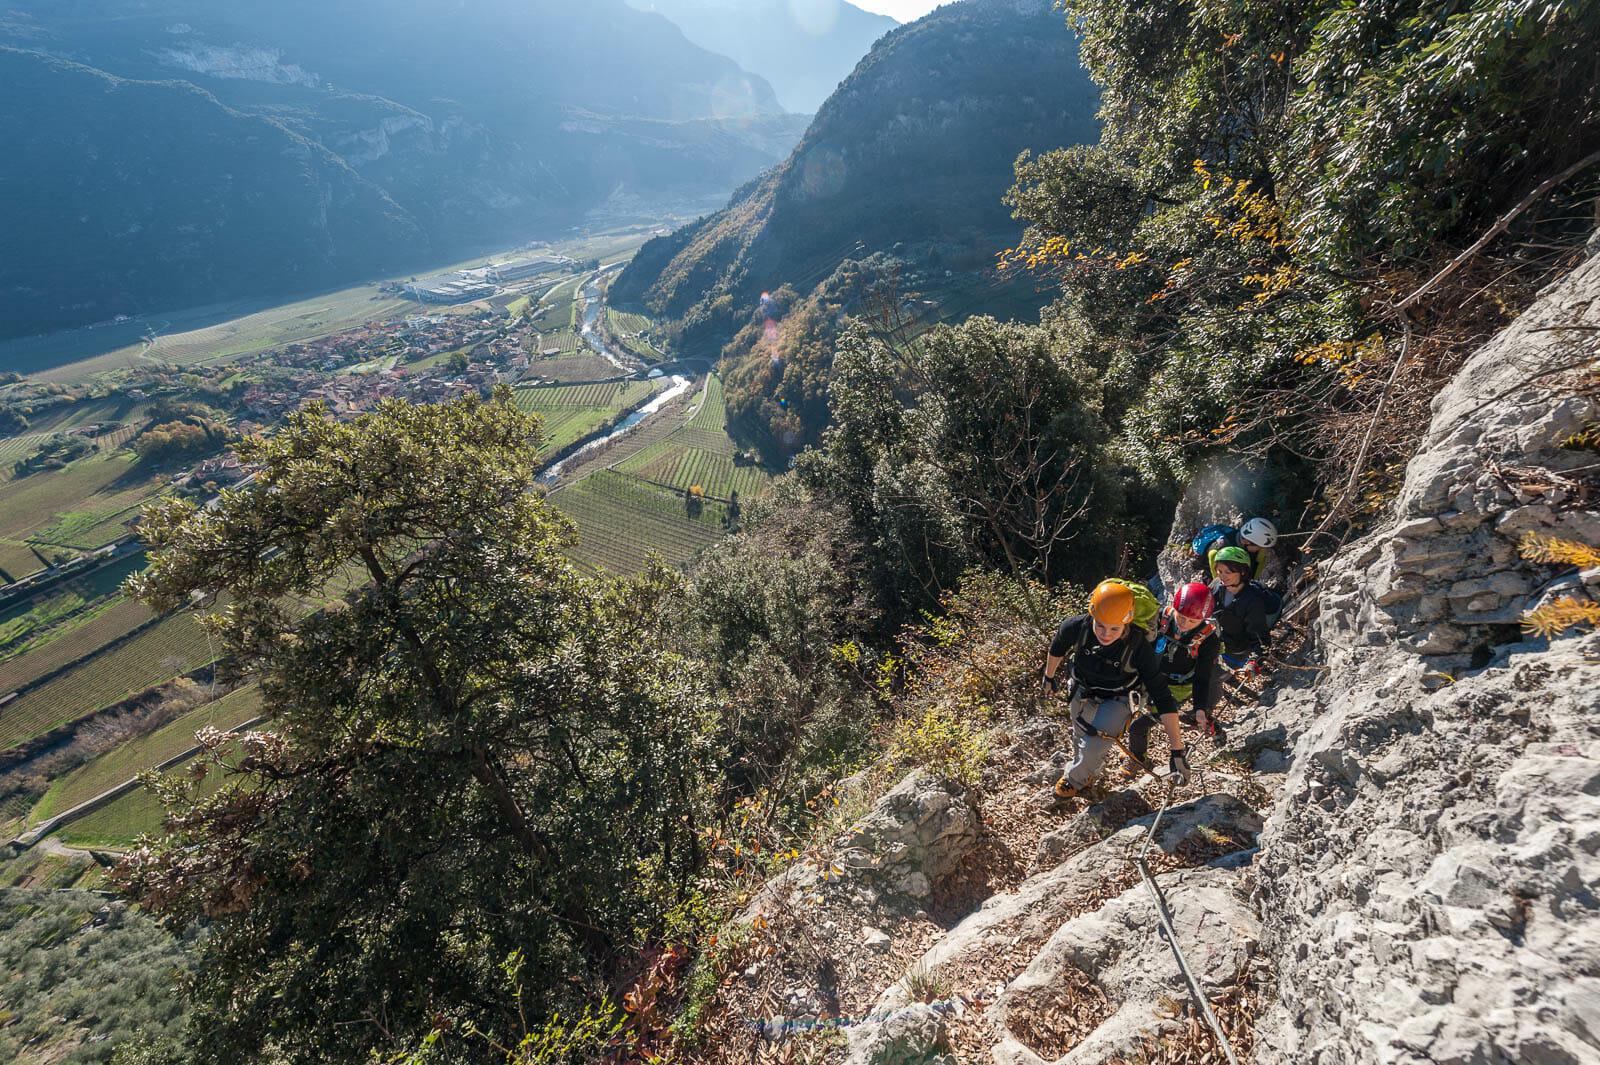 Klettersteig sentiero degli scaloni start